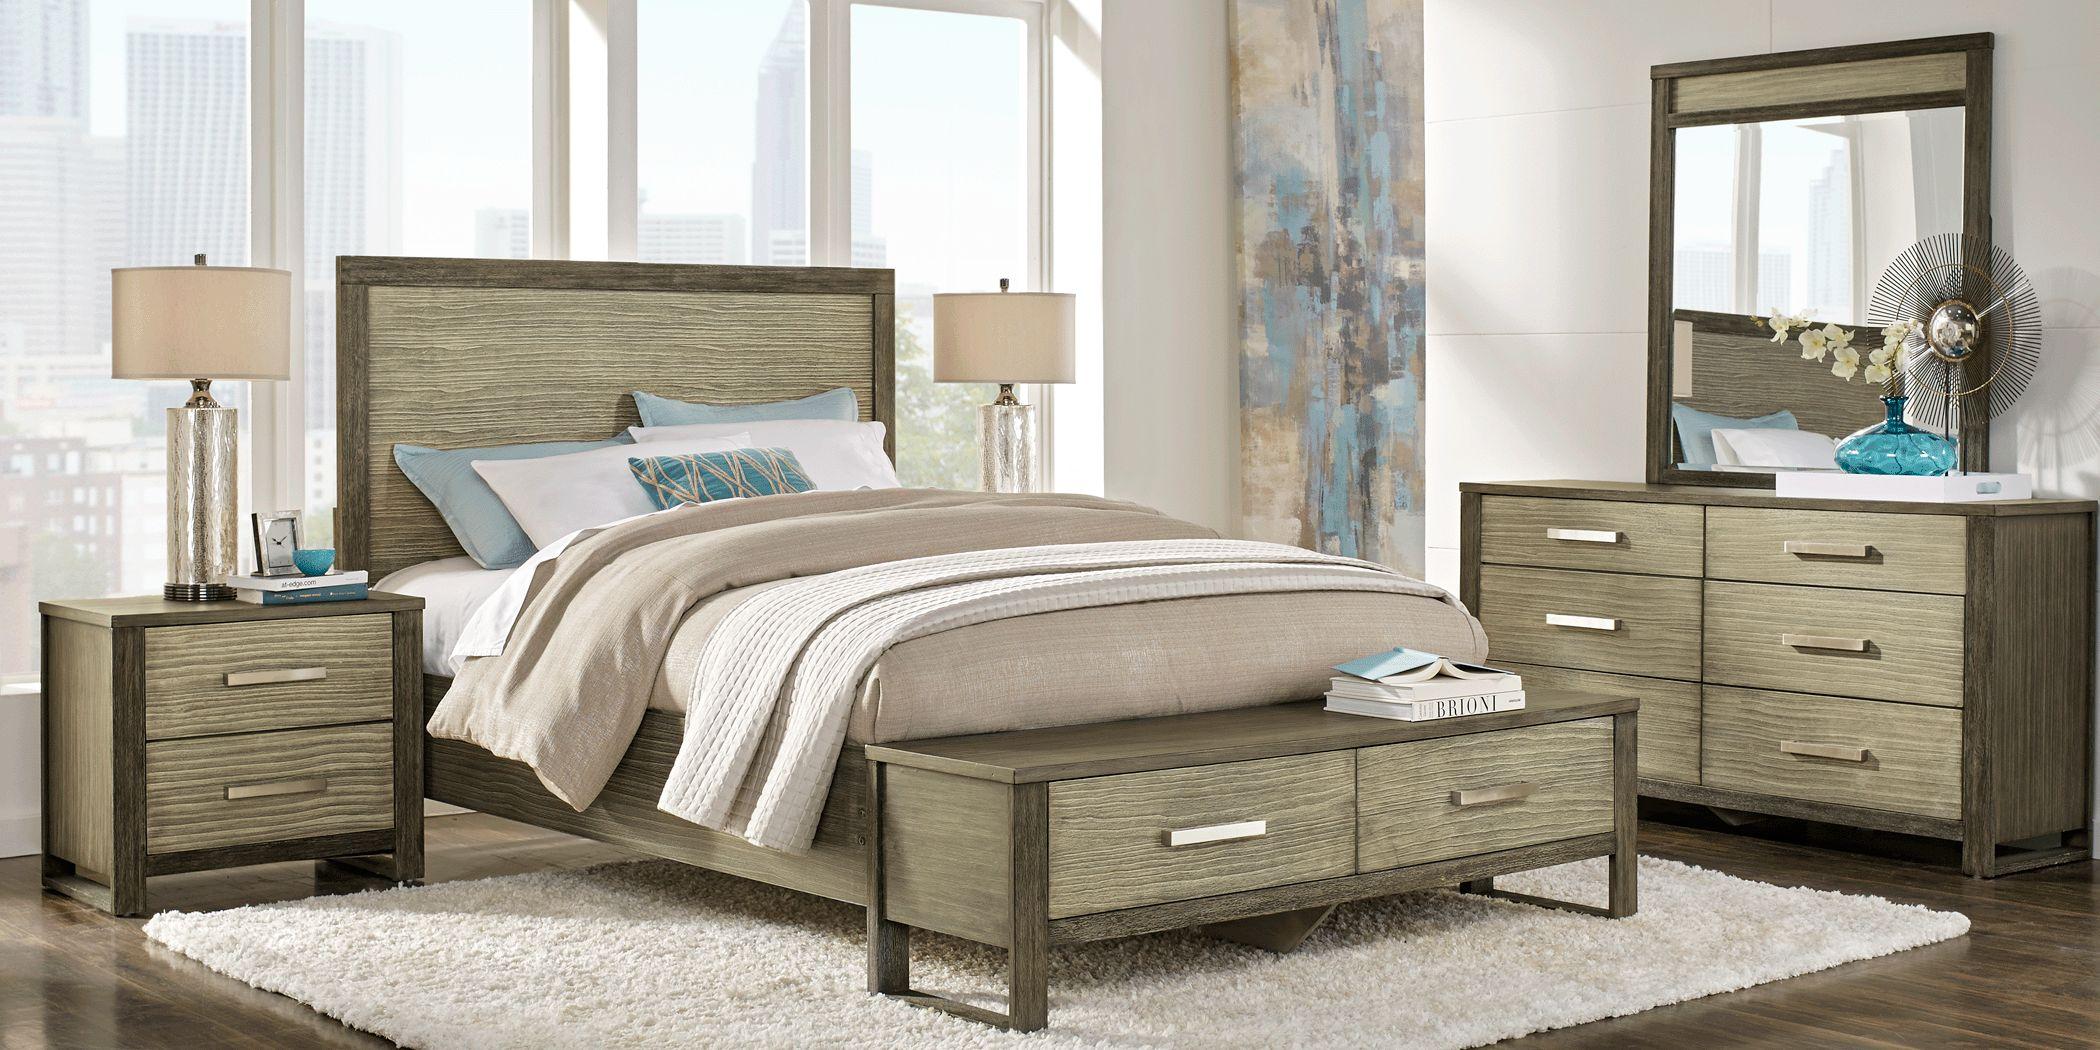 Abbott Gray 5 Pc King Panel Bedroom with Storage